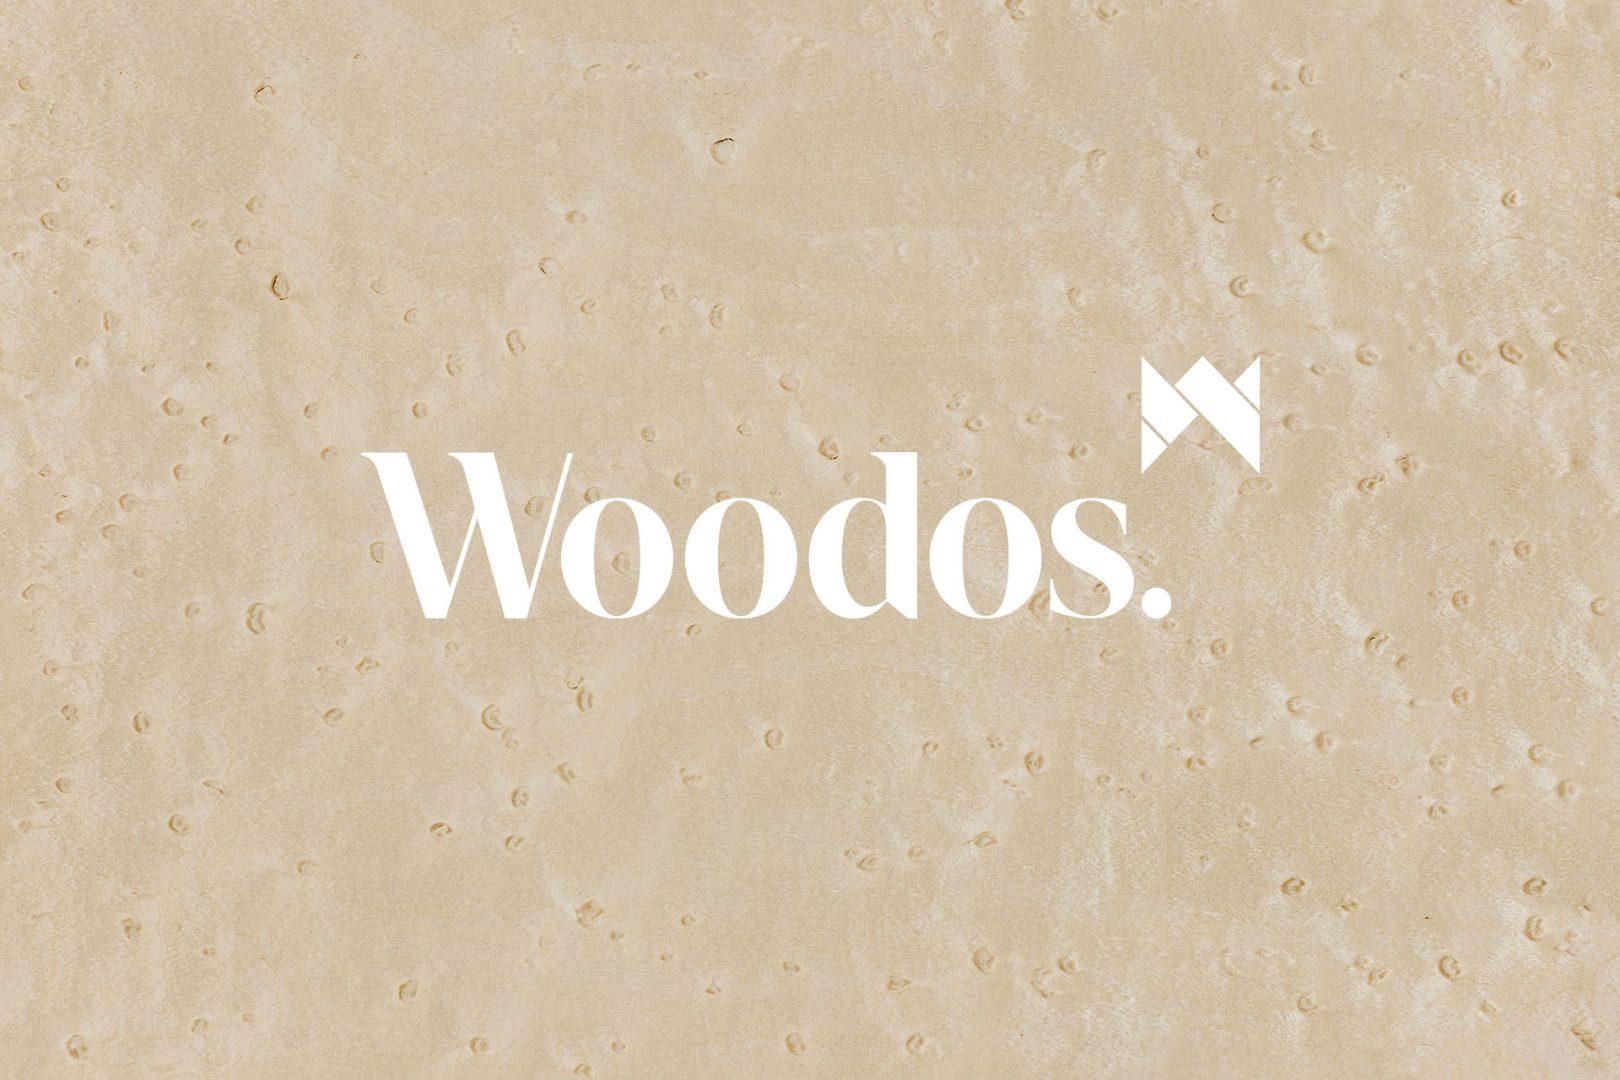 Woodos